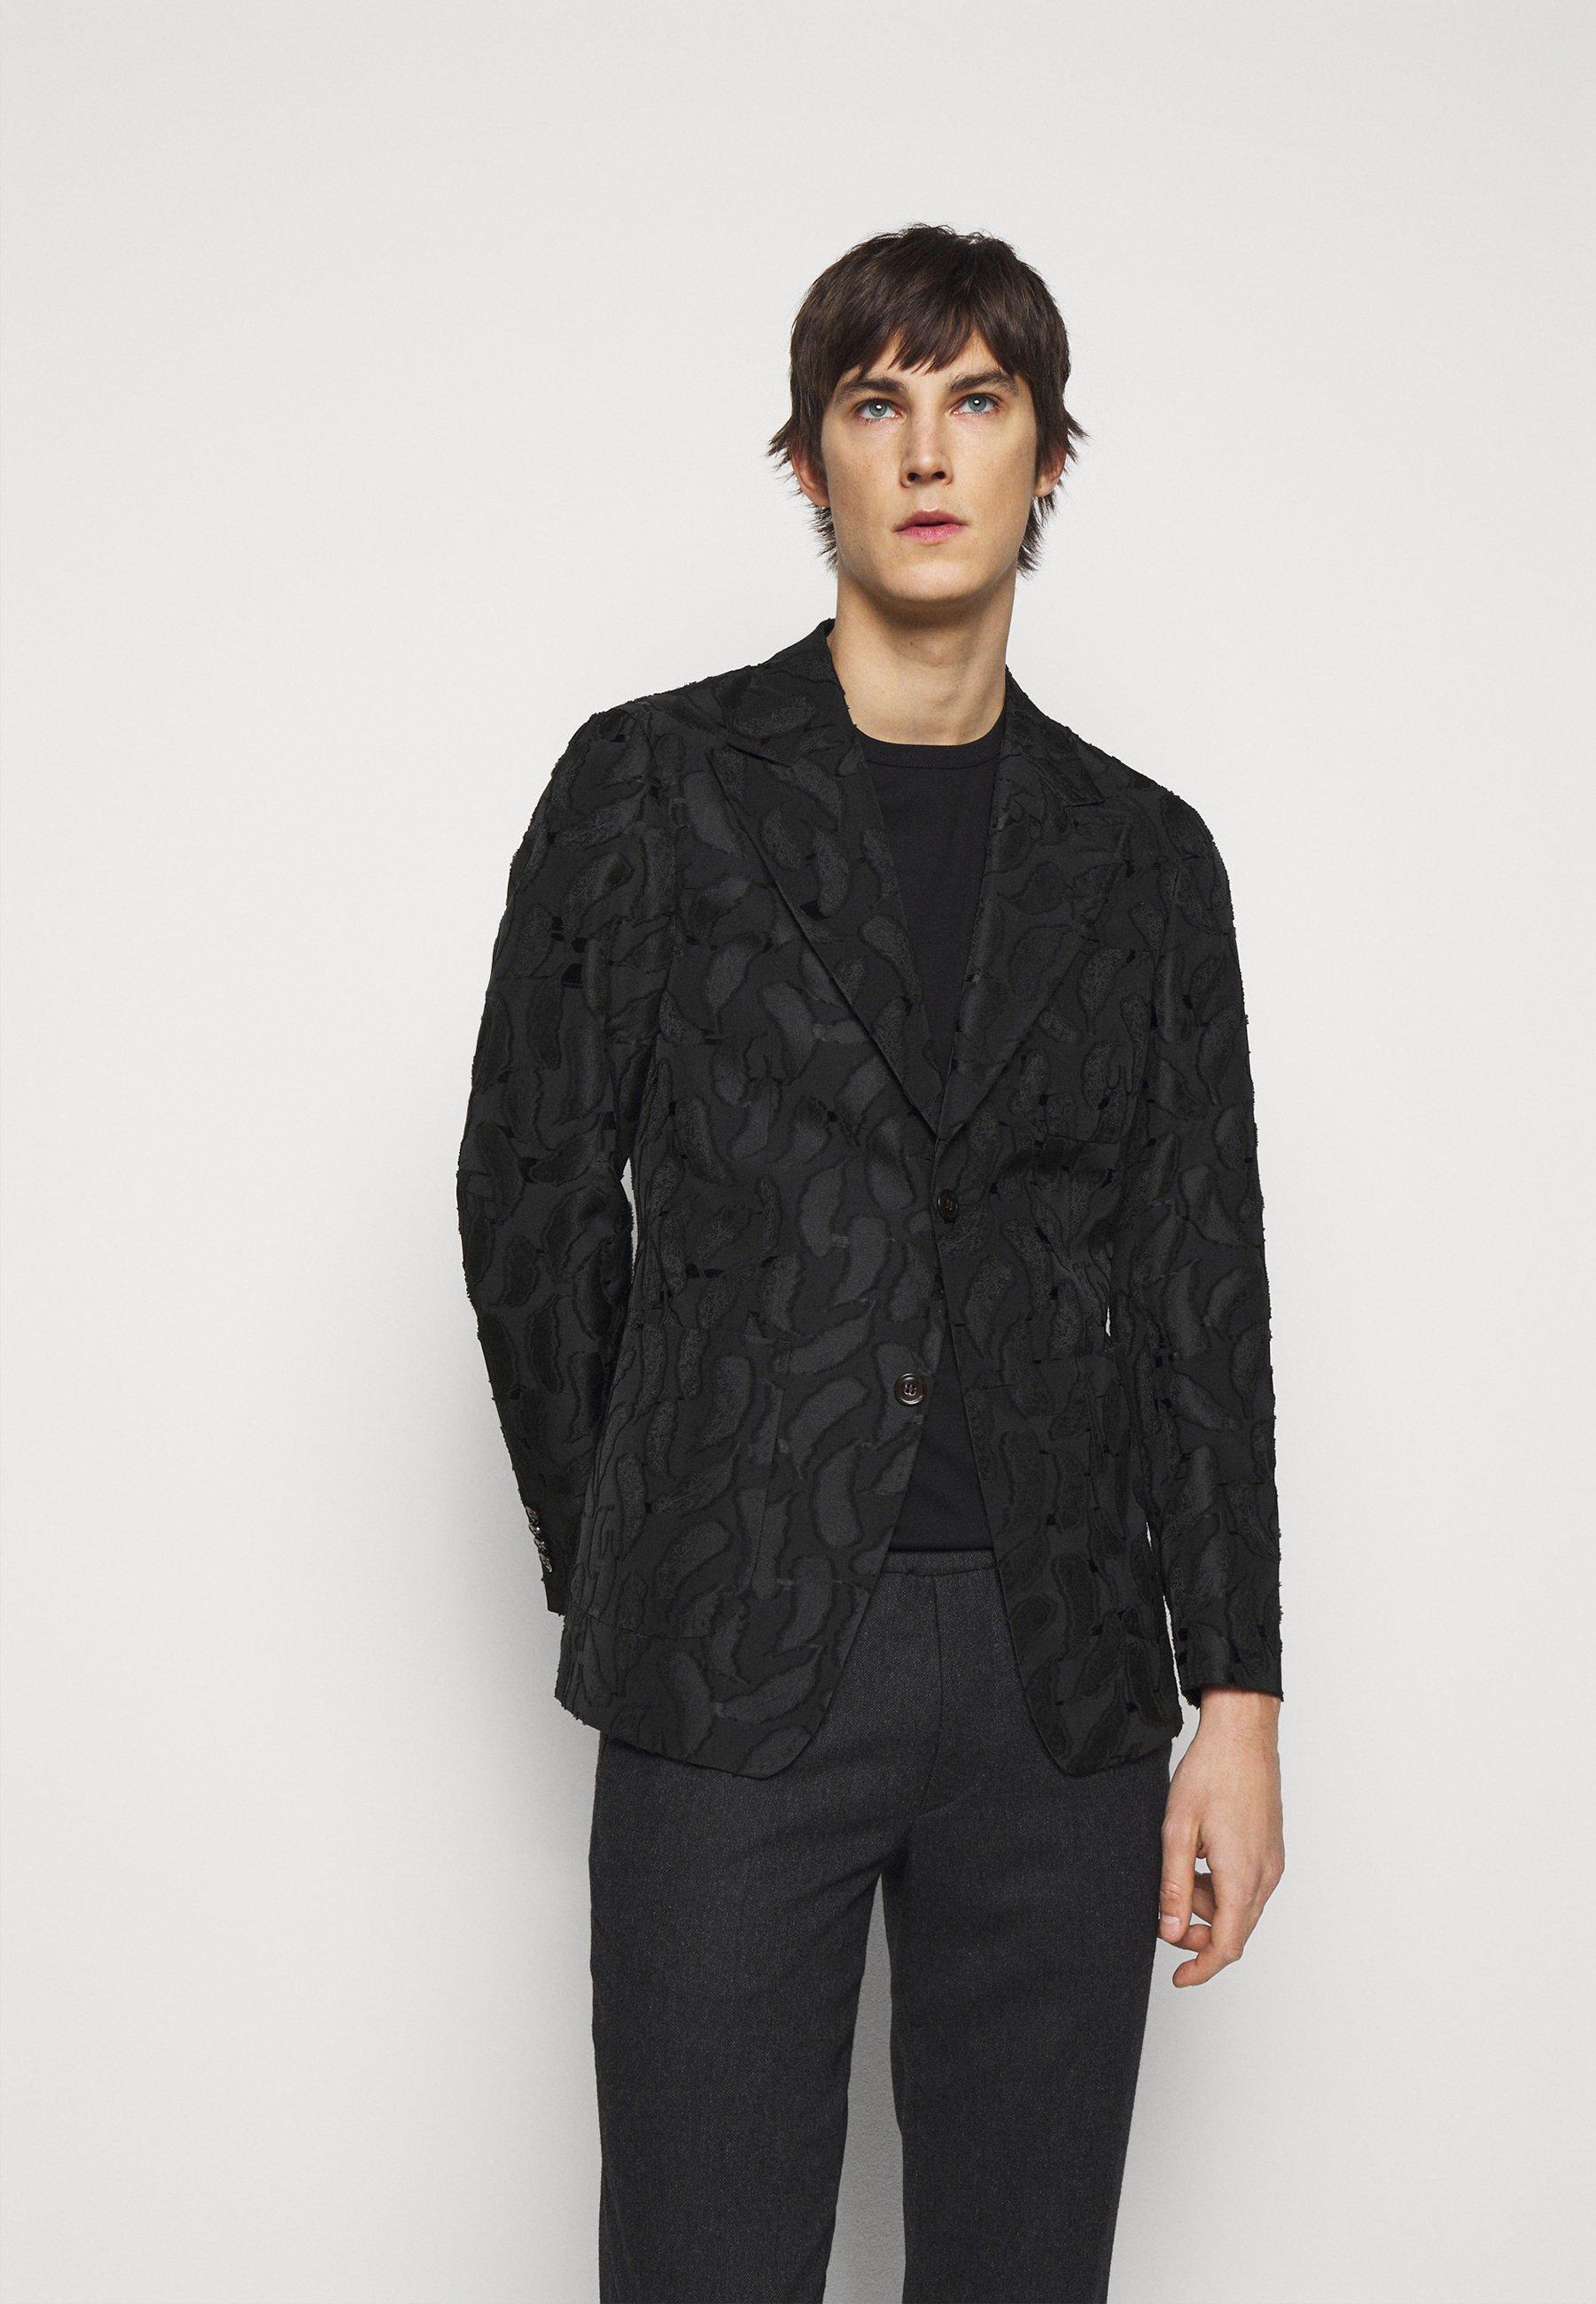 Men GIAVIO - Blazer jacket